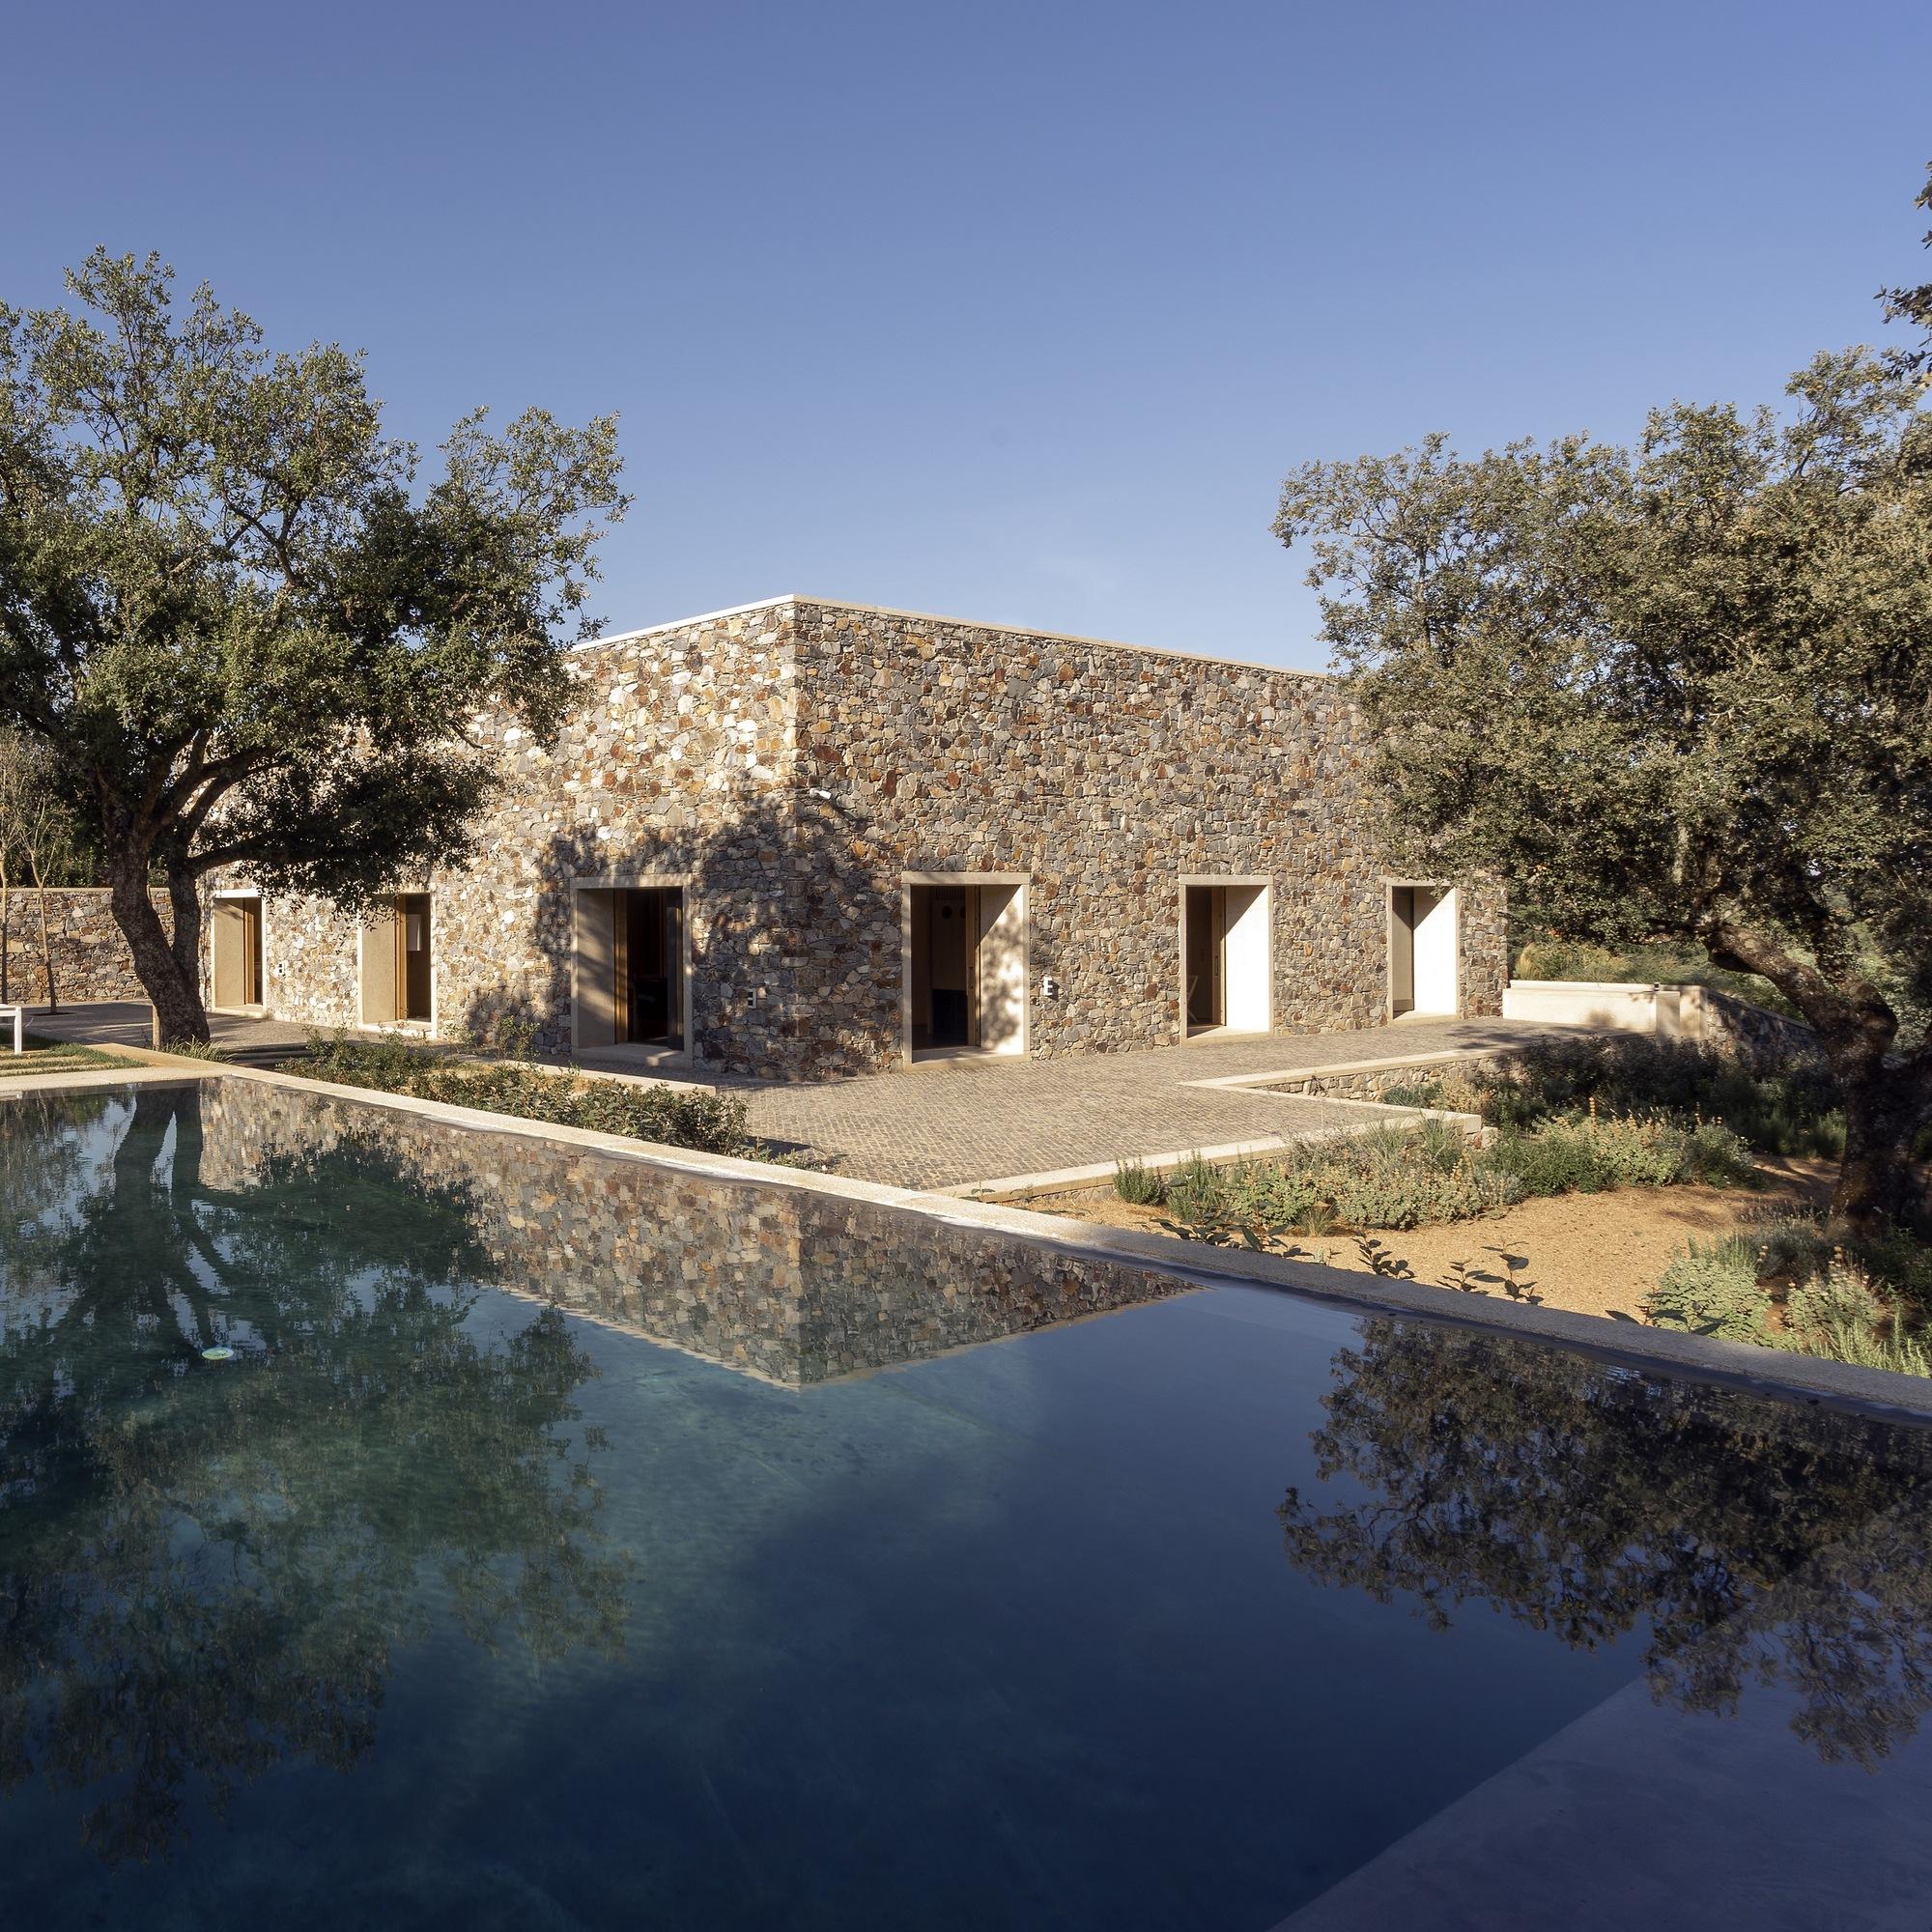 stone houses in c u00e1ceres    tu u00f1 u00f3n arquitectos